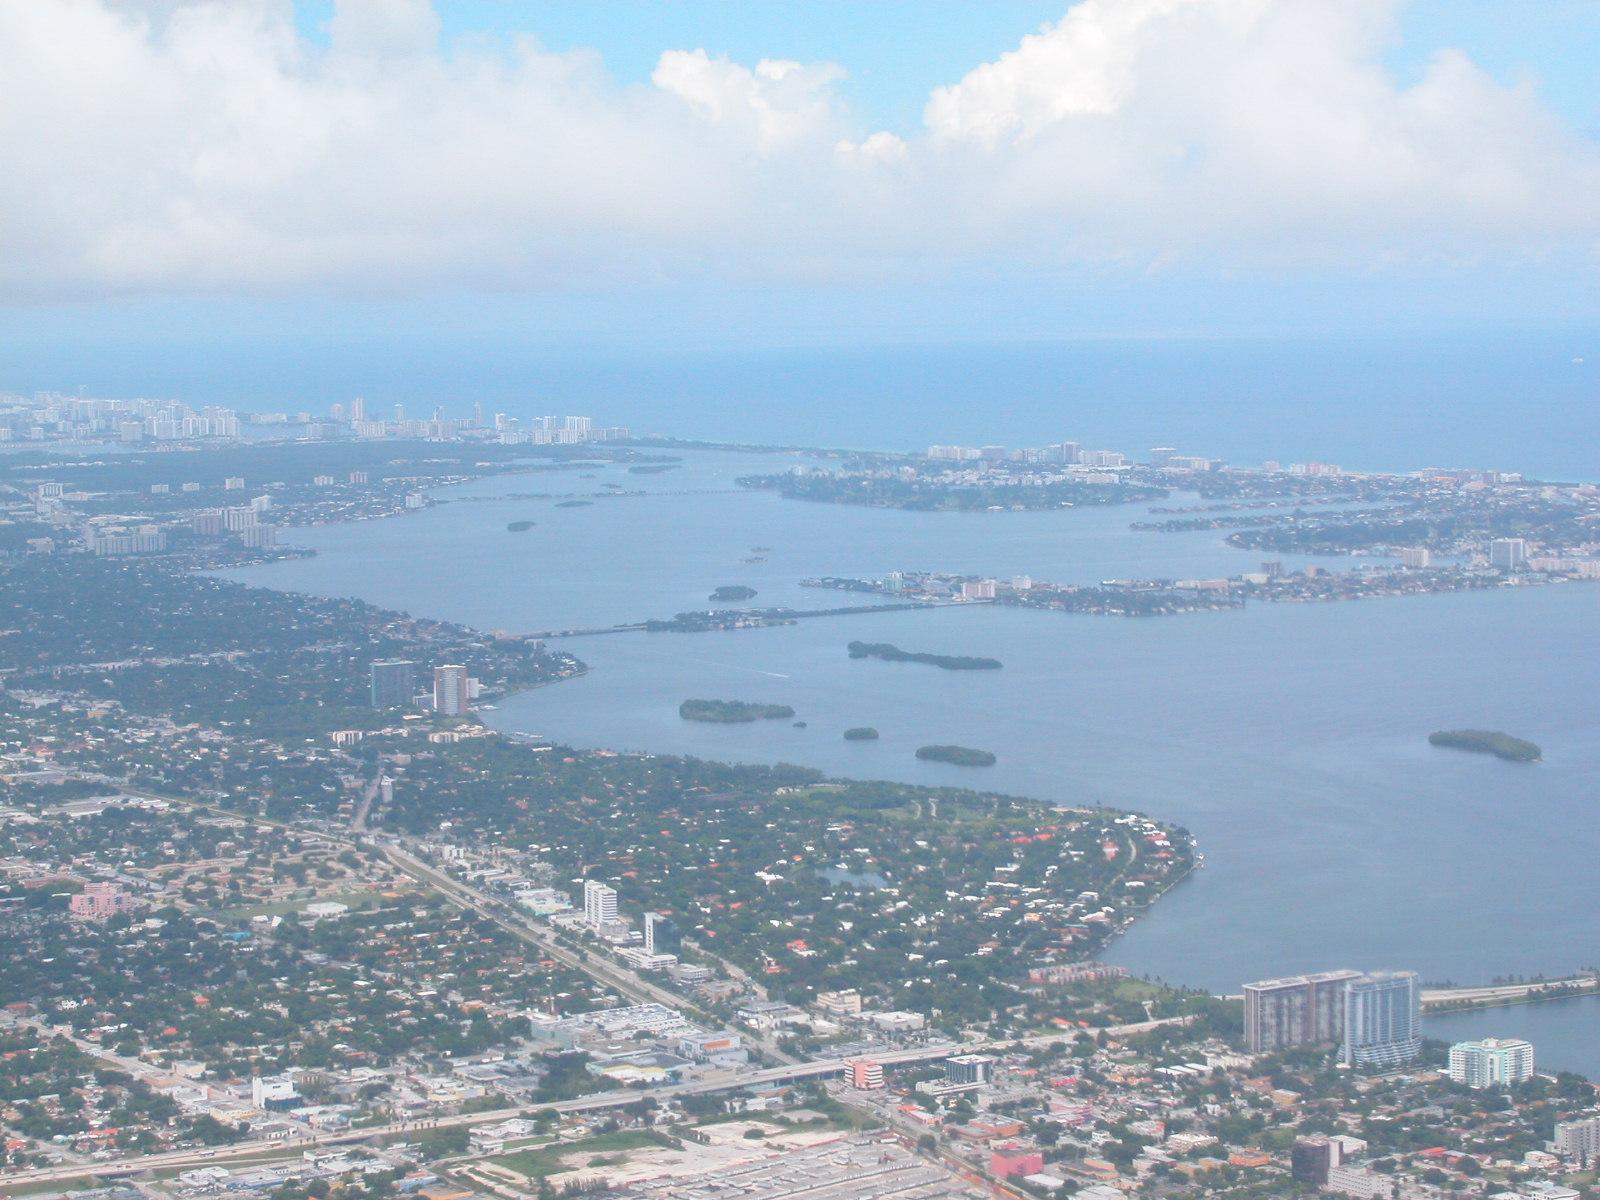 jacco bay city coastal coast roads bridges blue sea ocean island